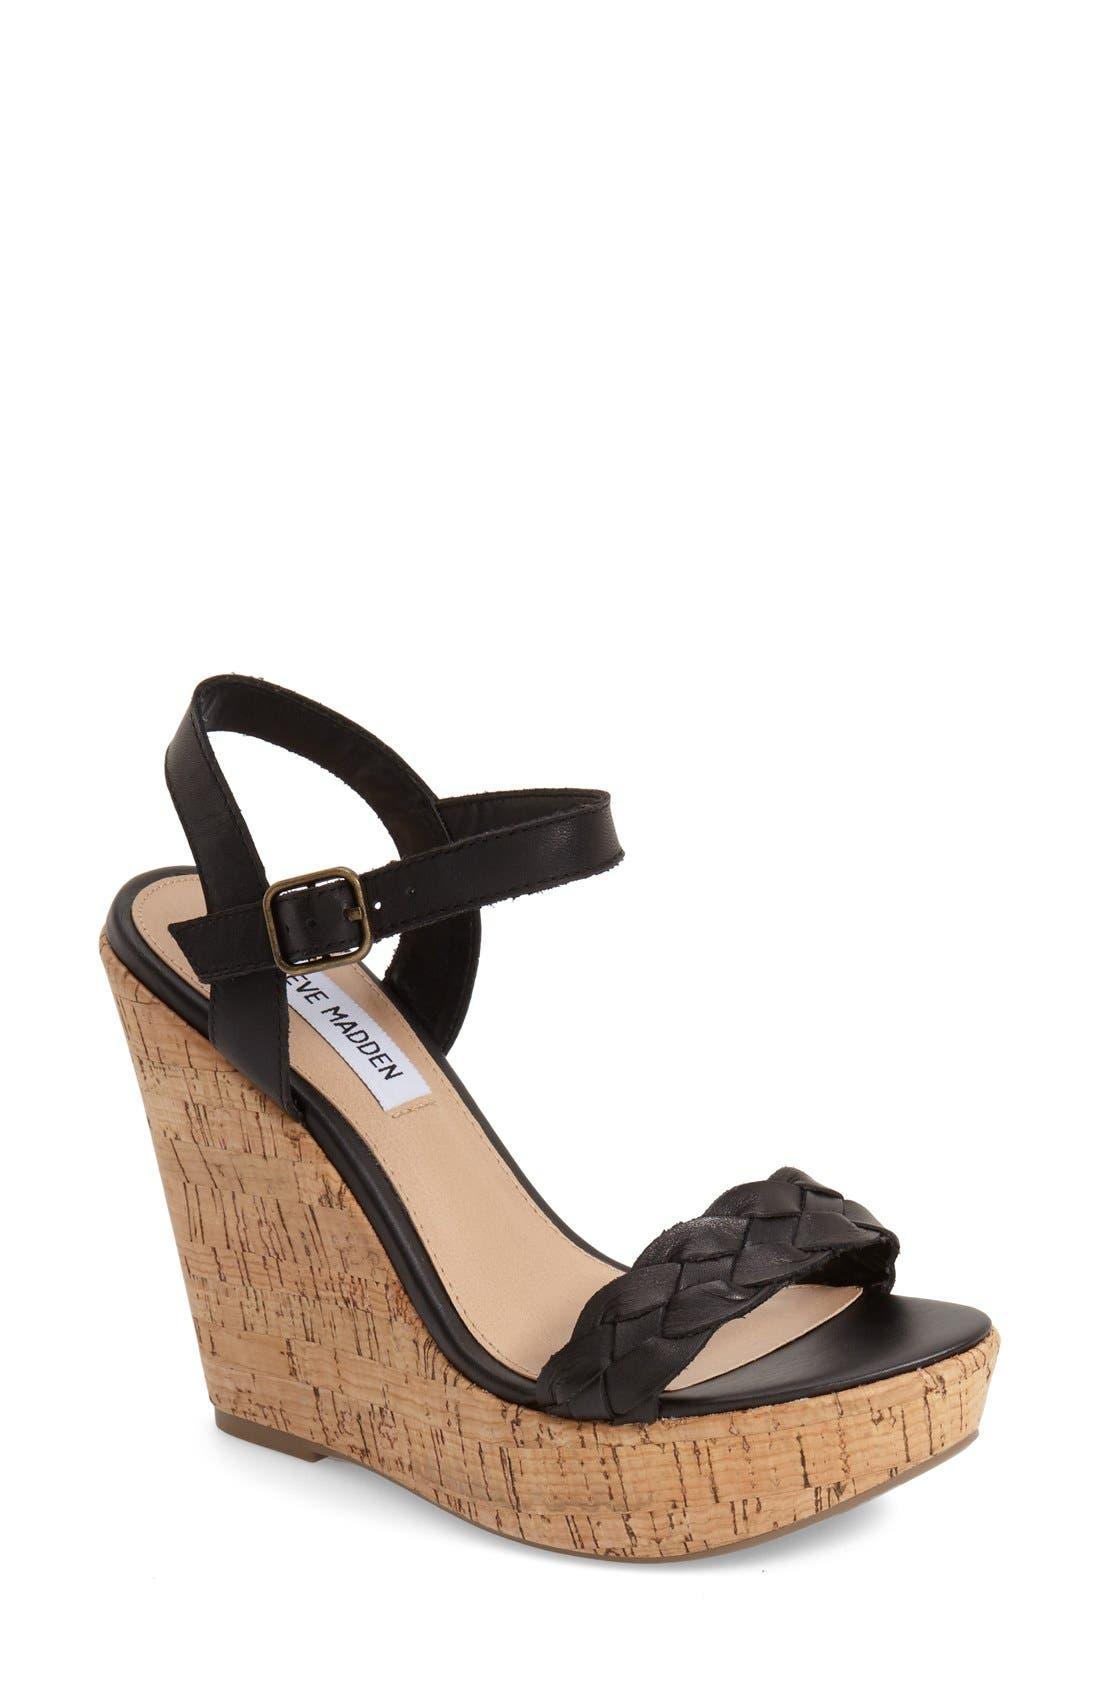 'Emmey' Platform Wedge Sandal,                             Main thumbnail 1, color,                             001